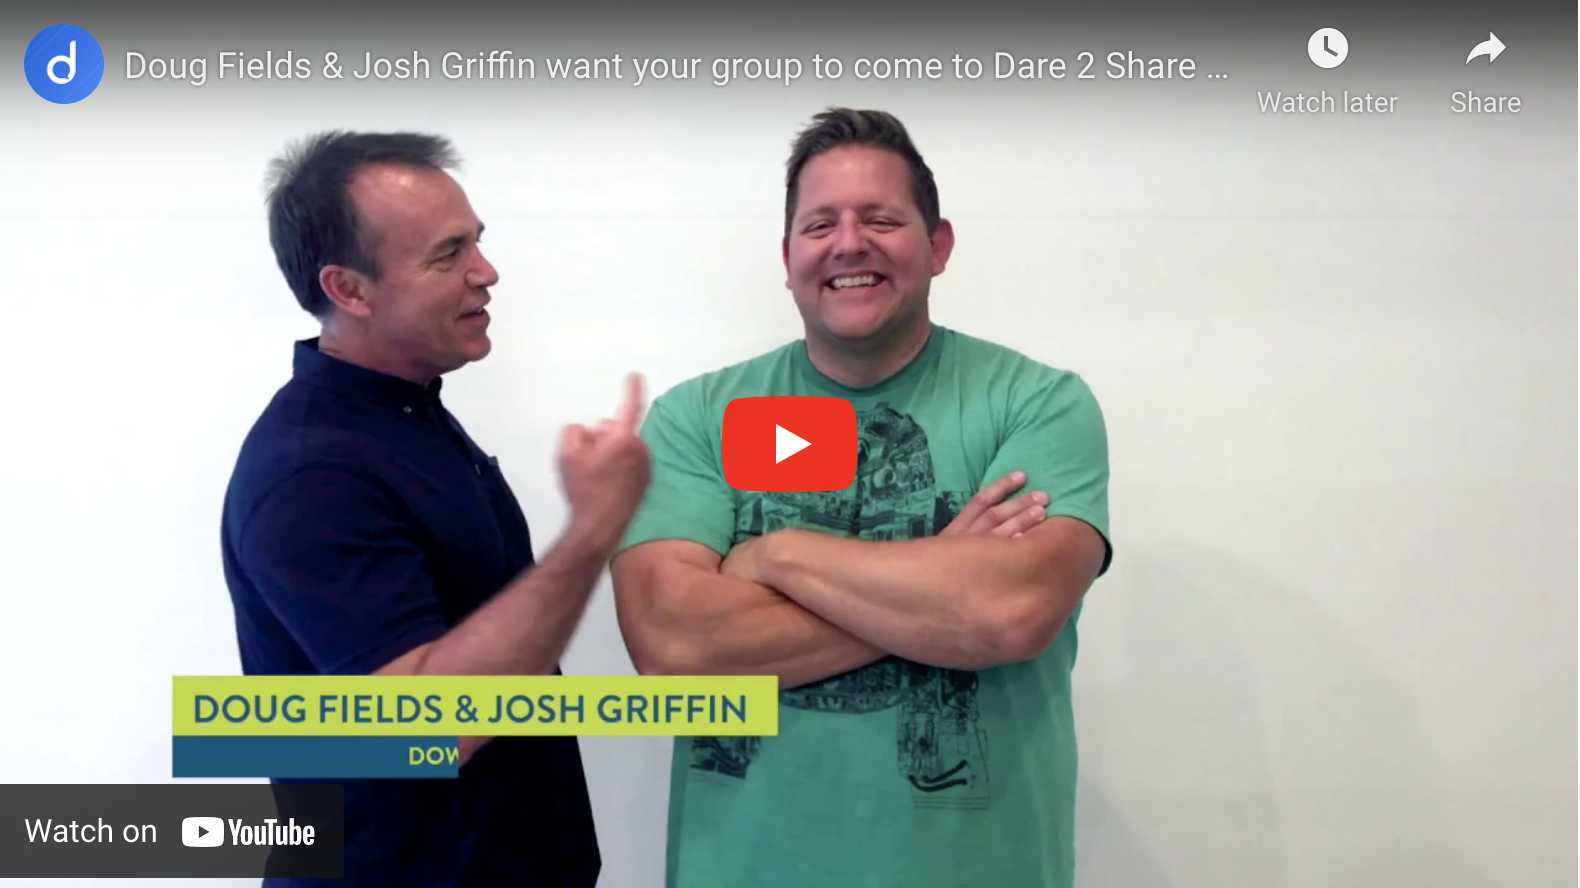 Doug Fields and Josh Griffin invite you to Dare 2 Share LIVE